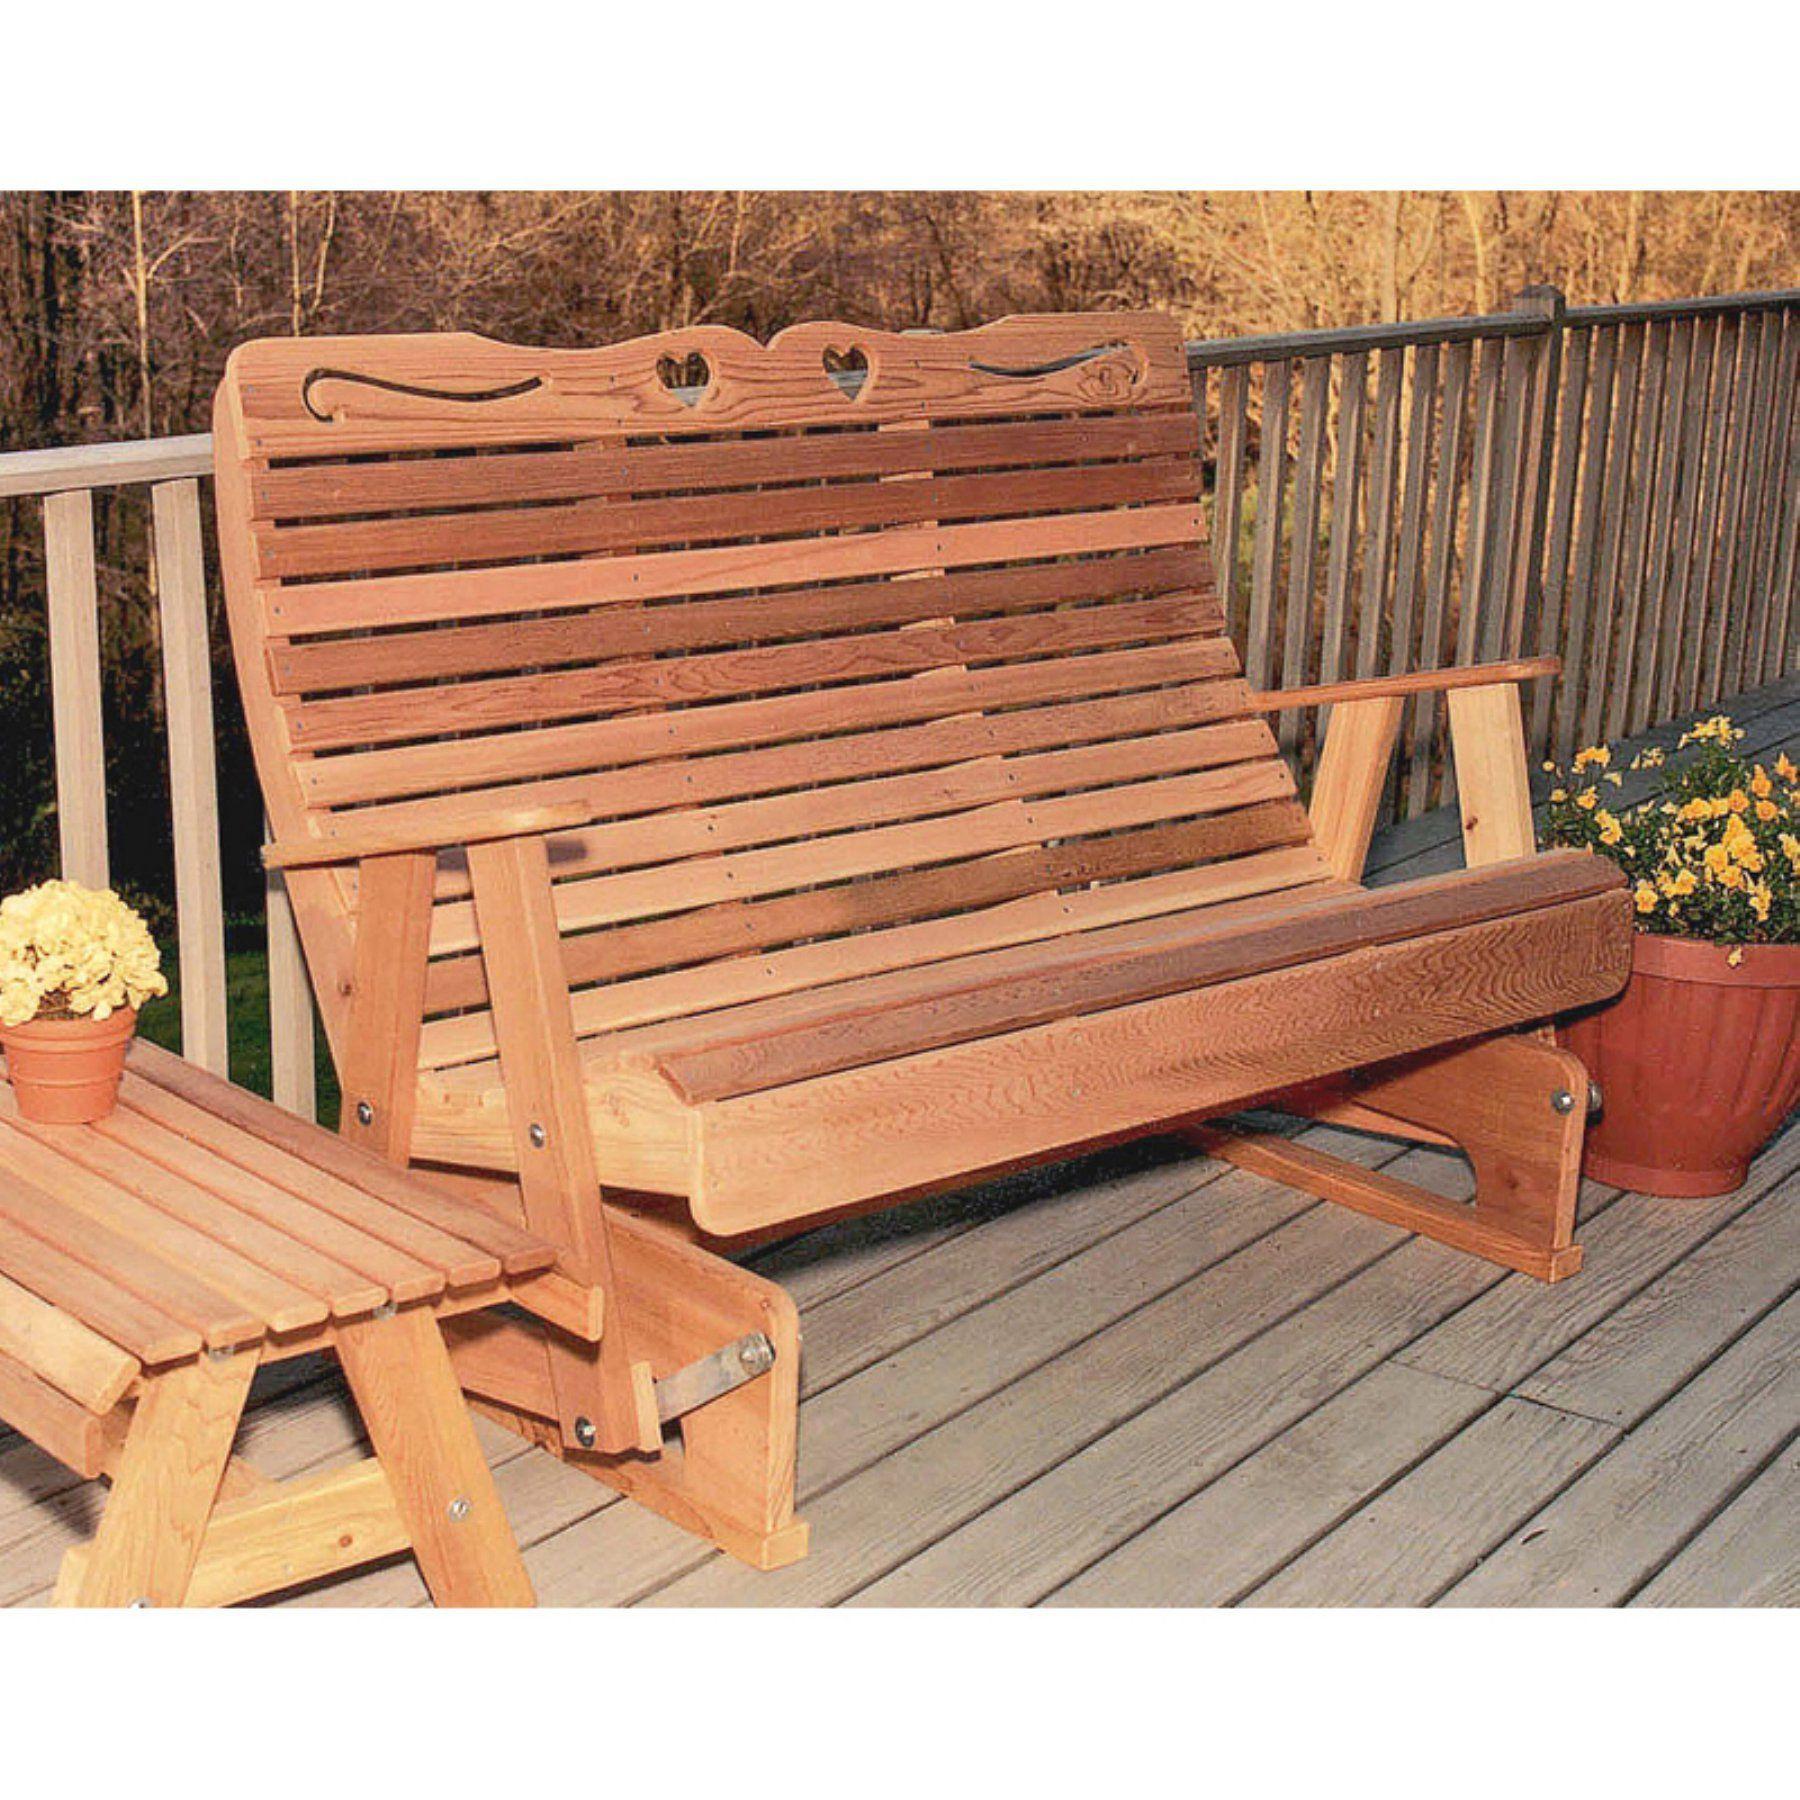 Discount Country Furniture: Creekvine Designs Country Hearts Cedar Bench Glider